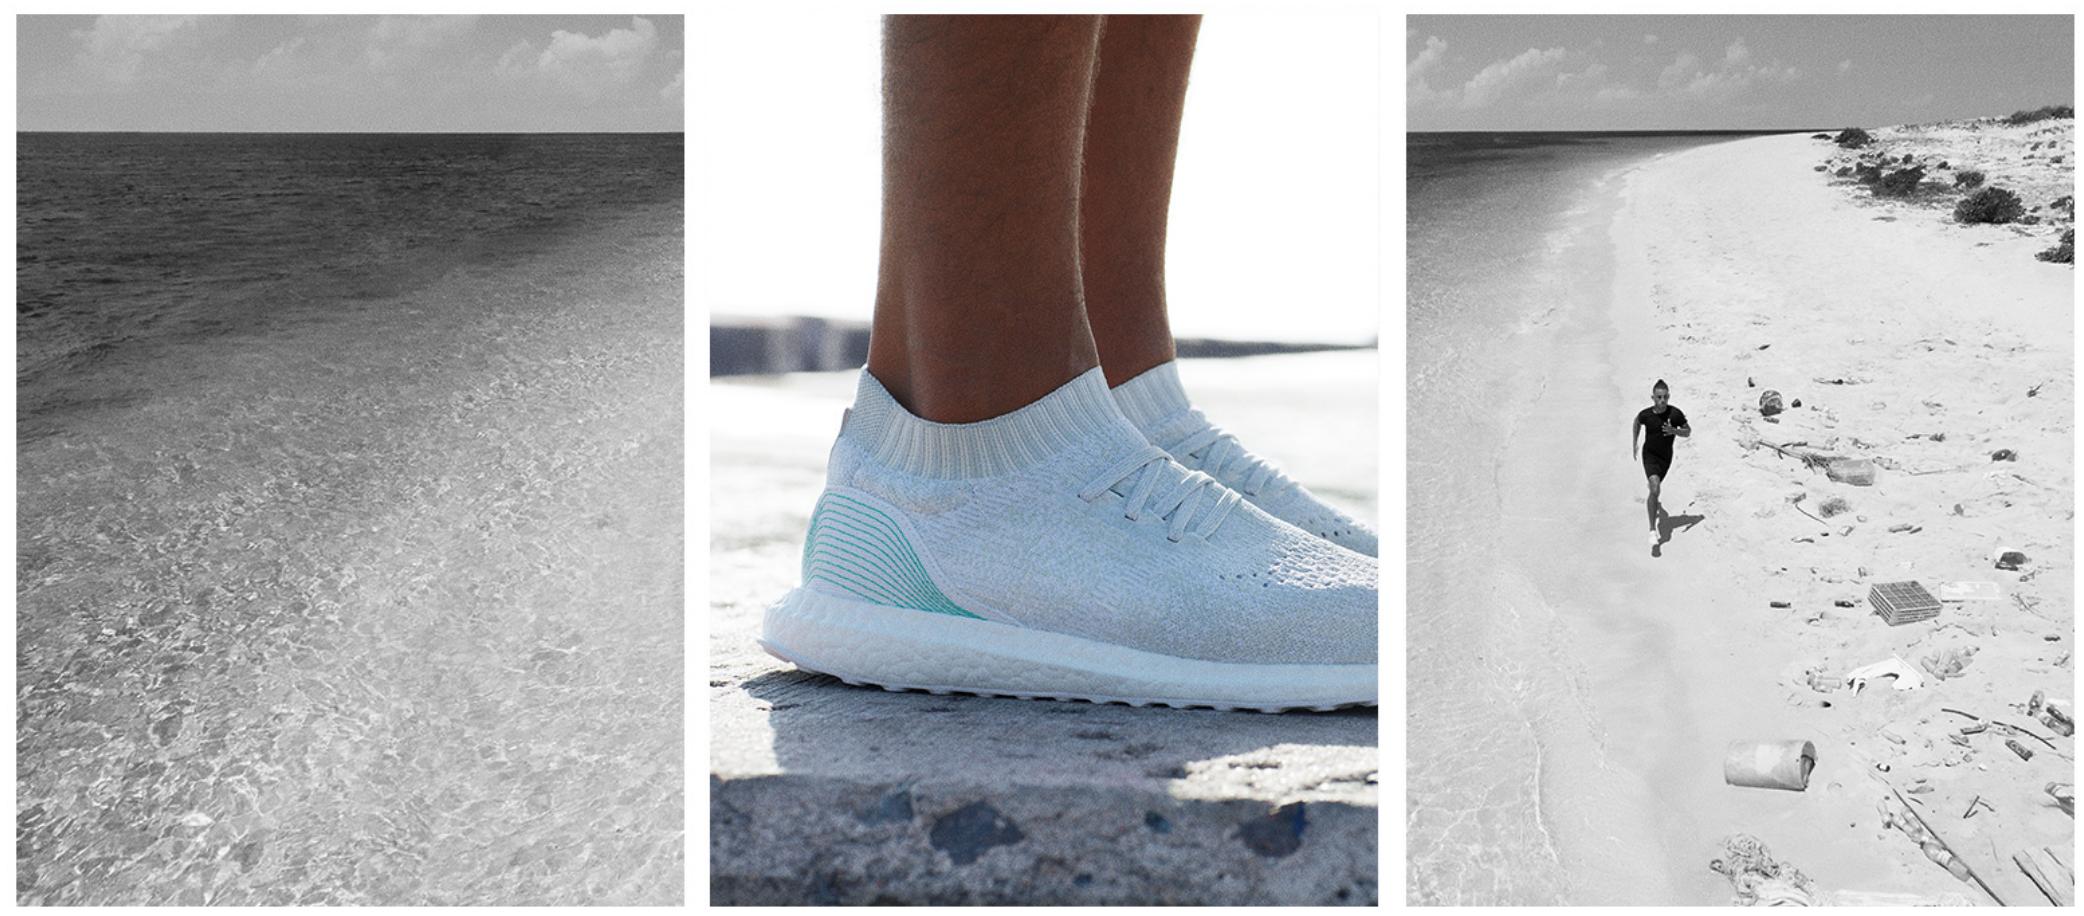 adidas UltraBOOST Uncaged Parley - Der Meeresabfall Sneaker